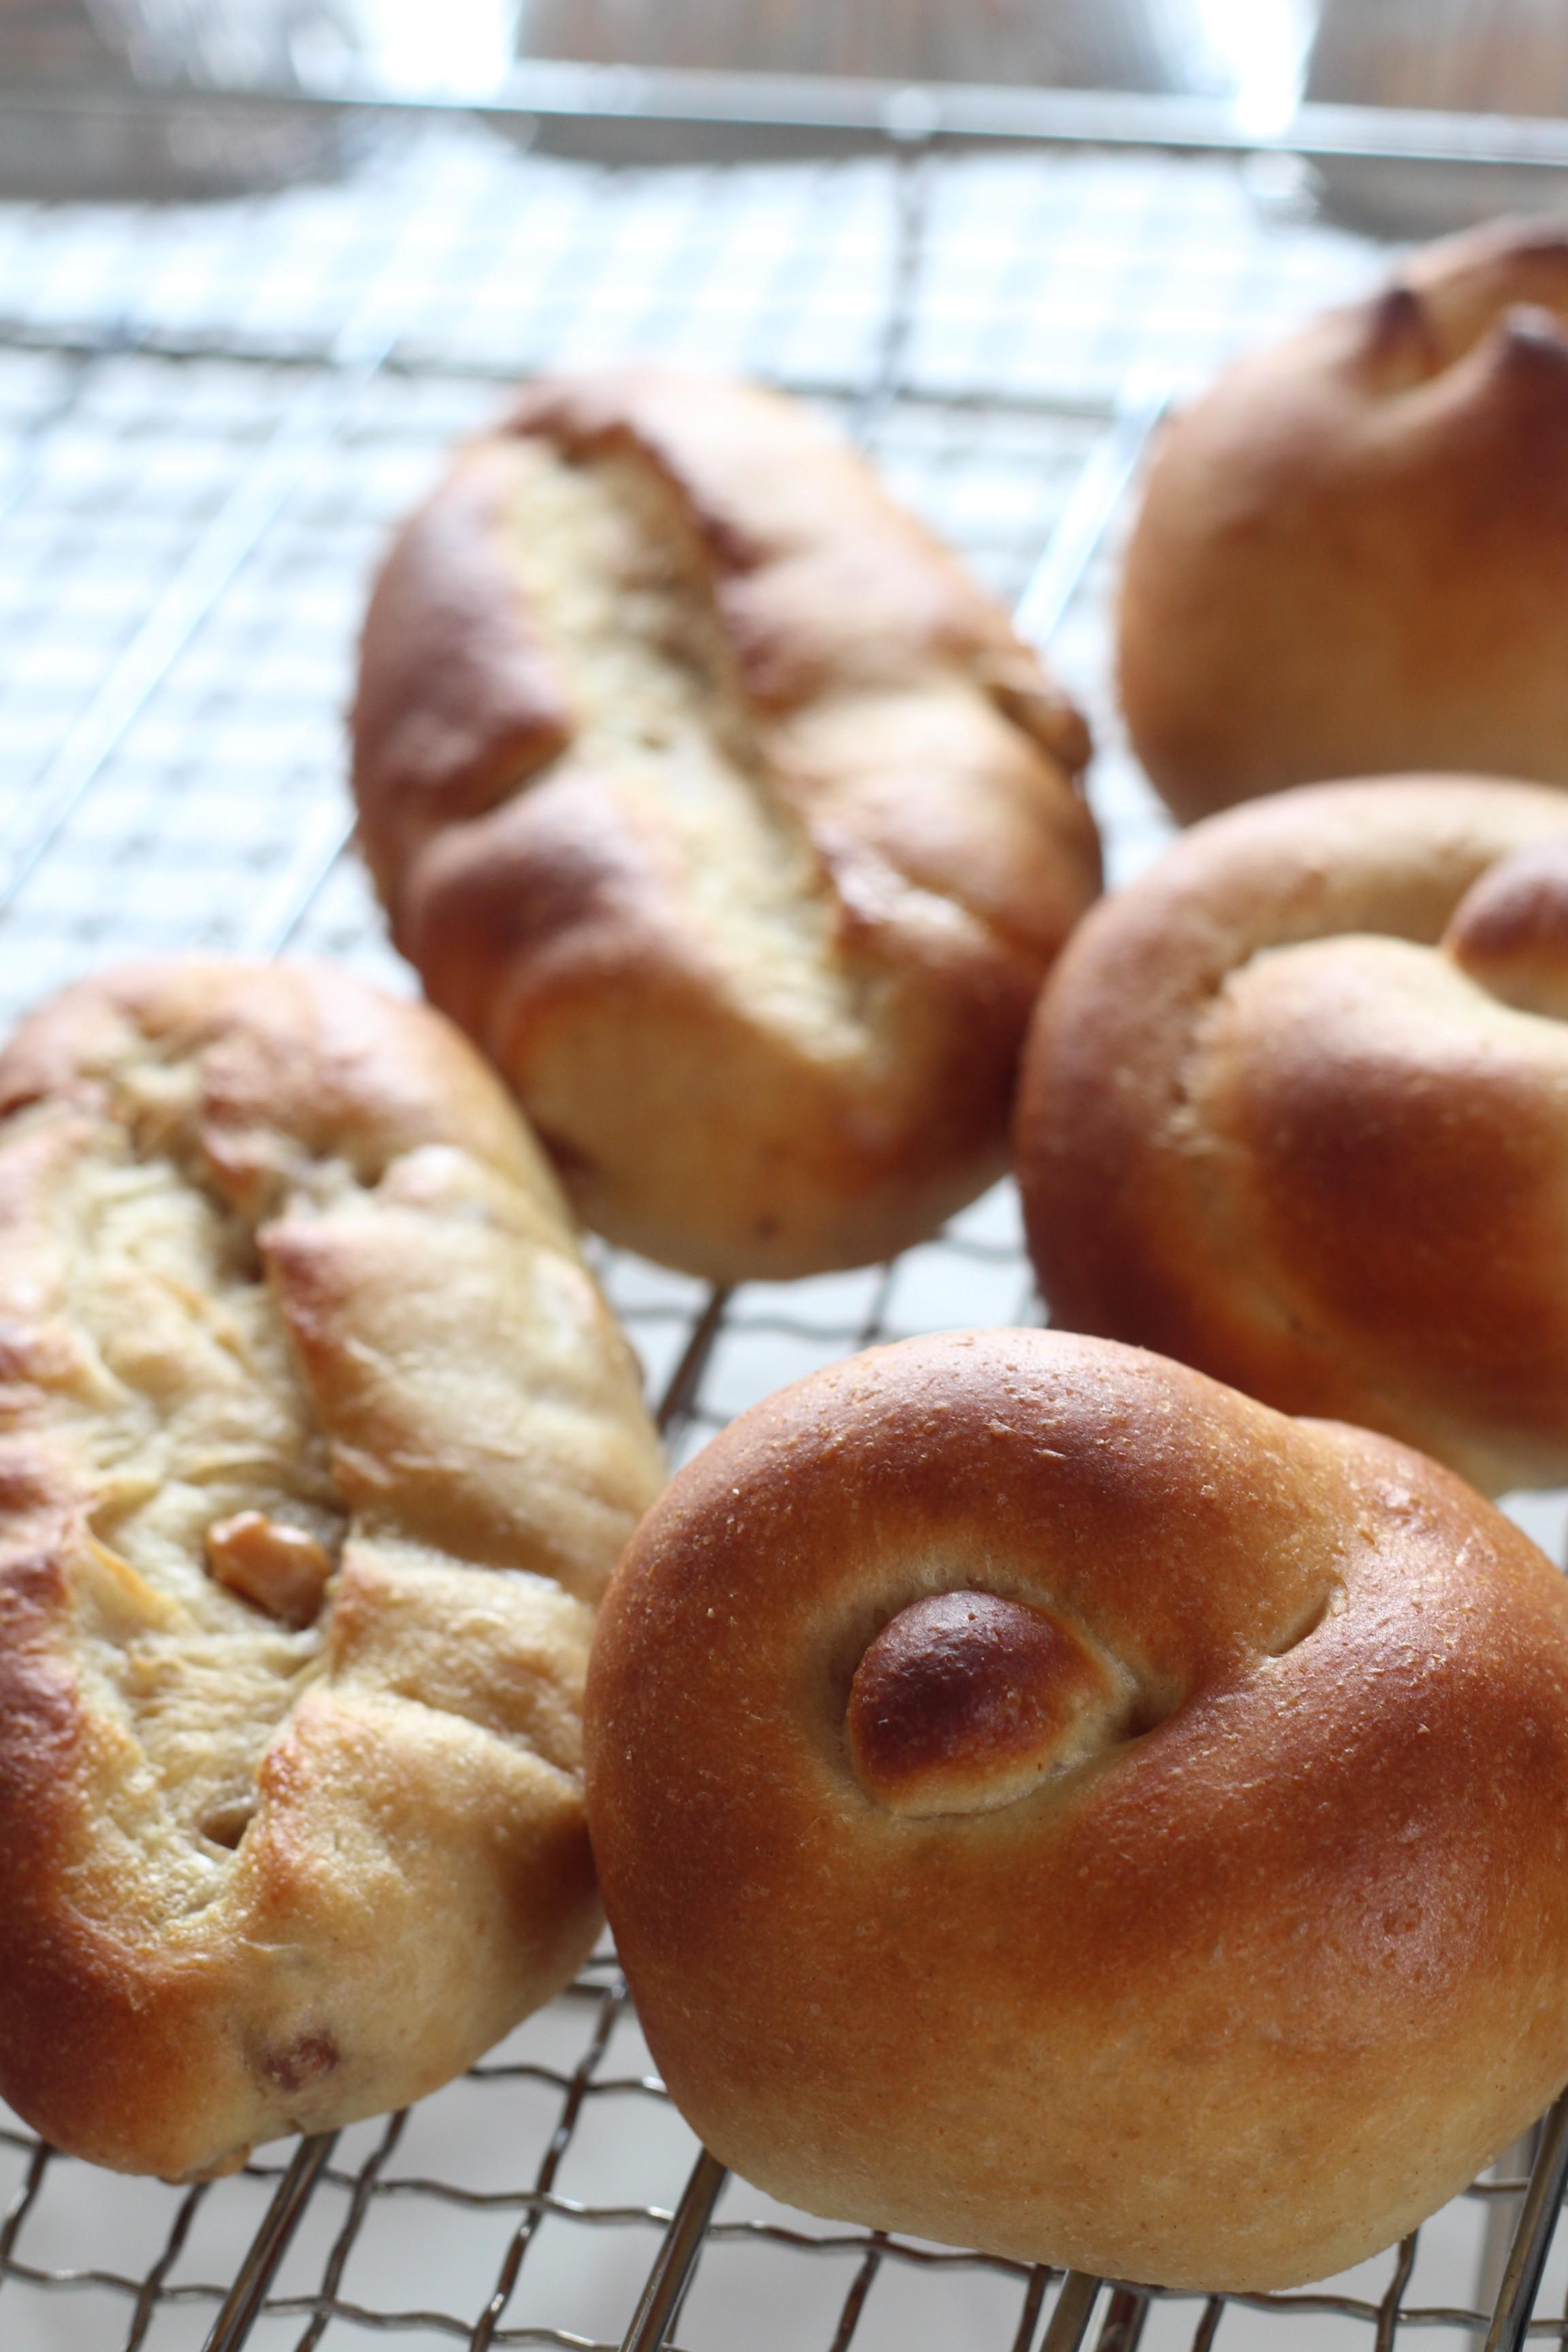 a-ta-sante糖質制限パン料理教室。阿倍野区西田辺。京都江部粉を使った糖質制限パンと糖質オフのランチ講習会。